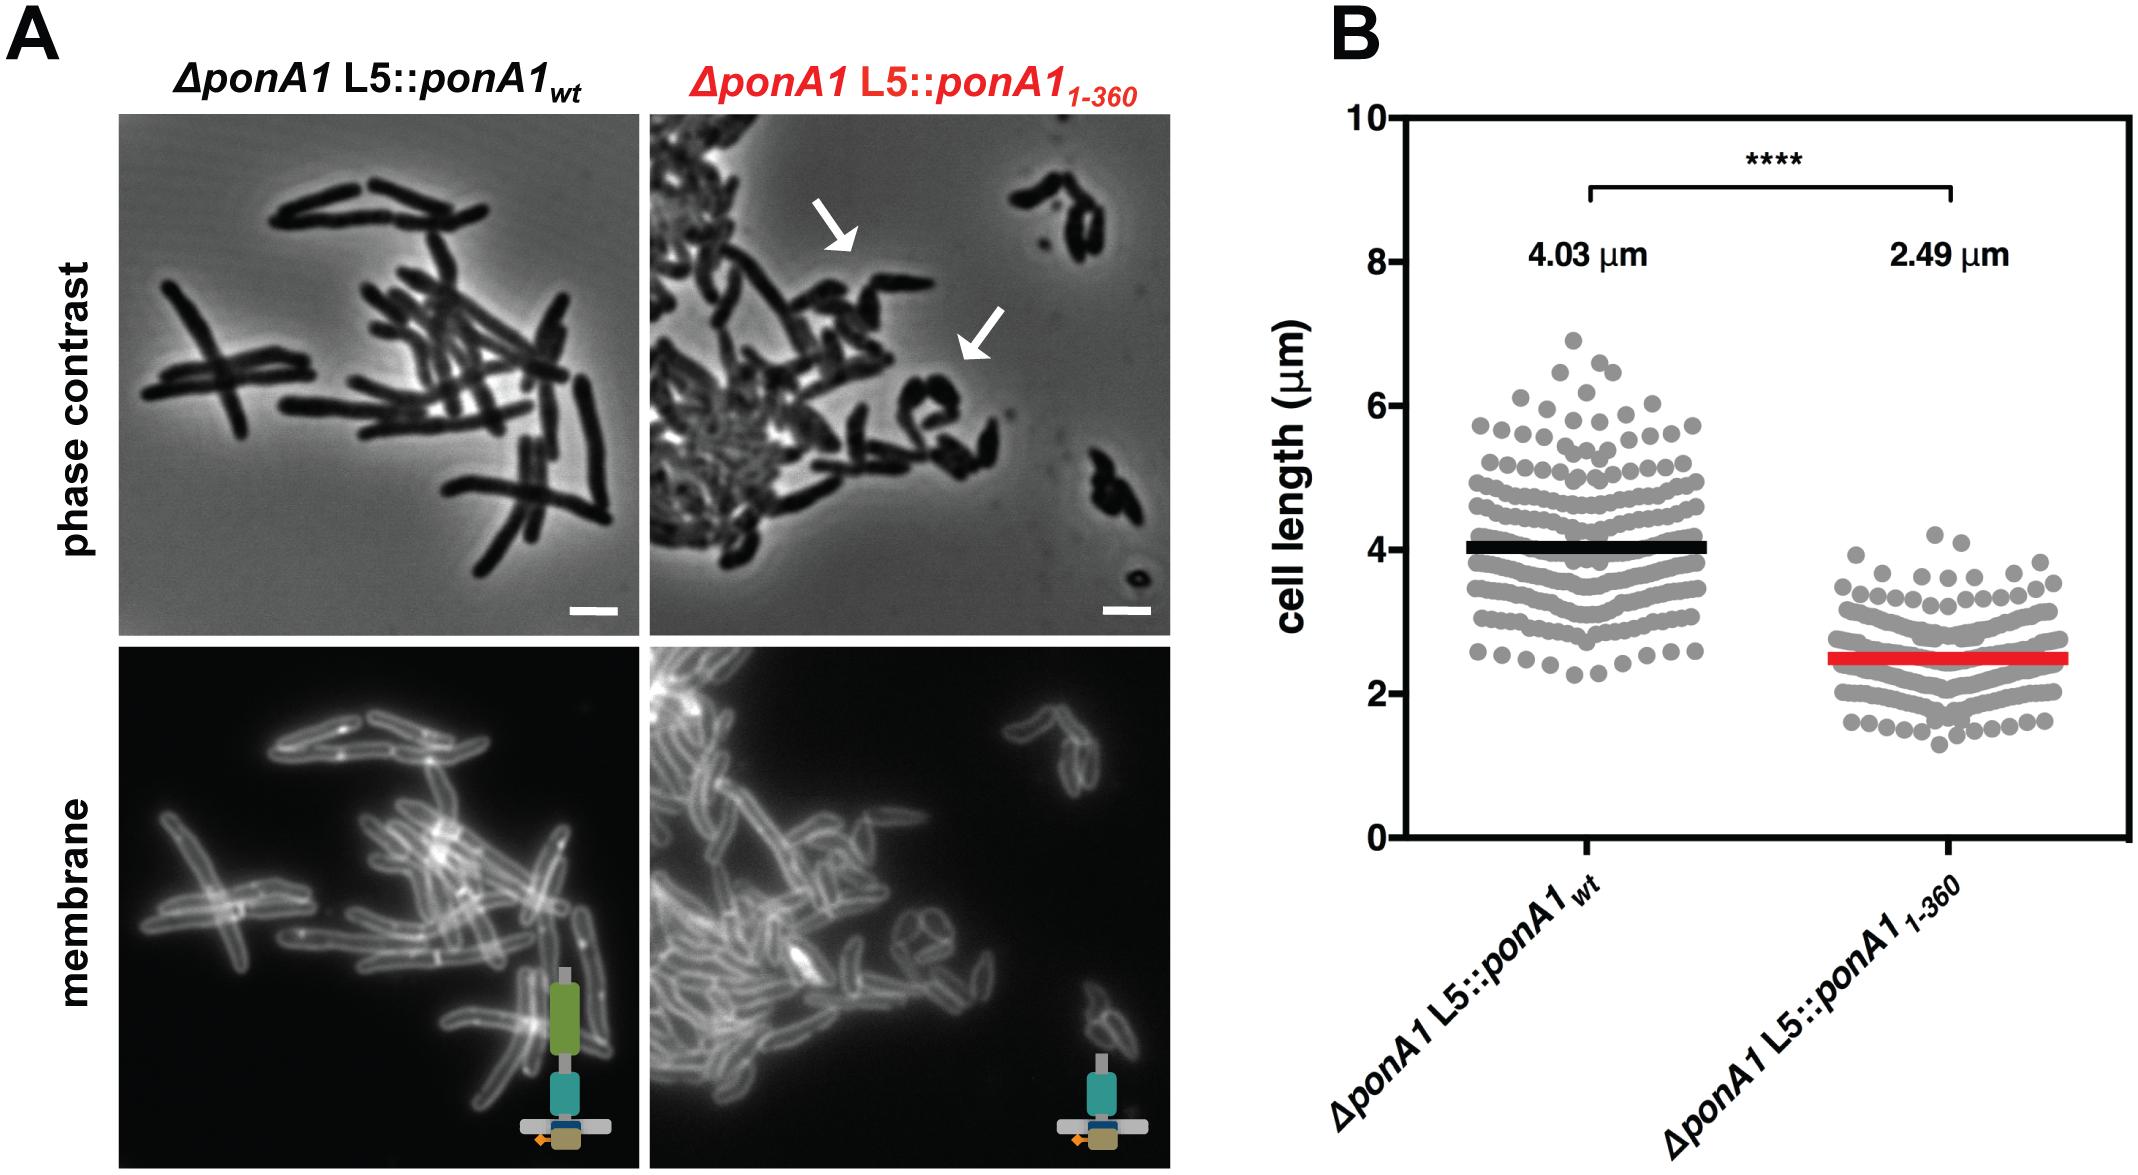 PonA1's periplasmic domains modulate cell shape in mycobacteria.